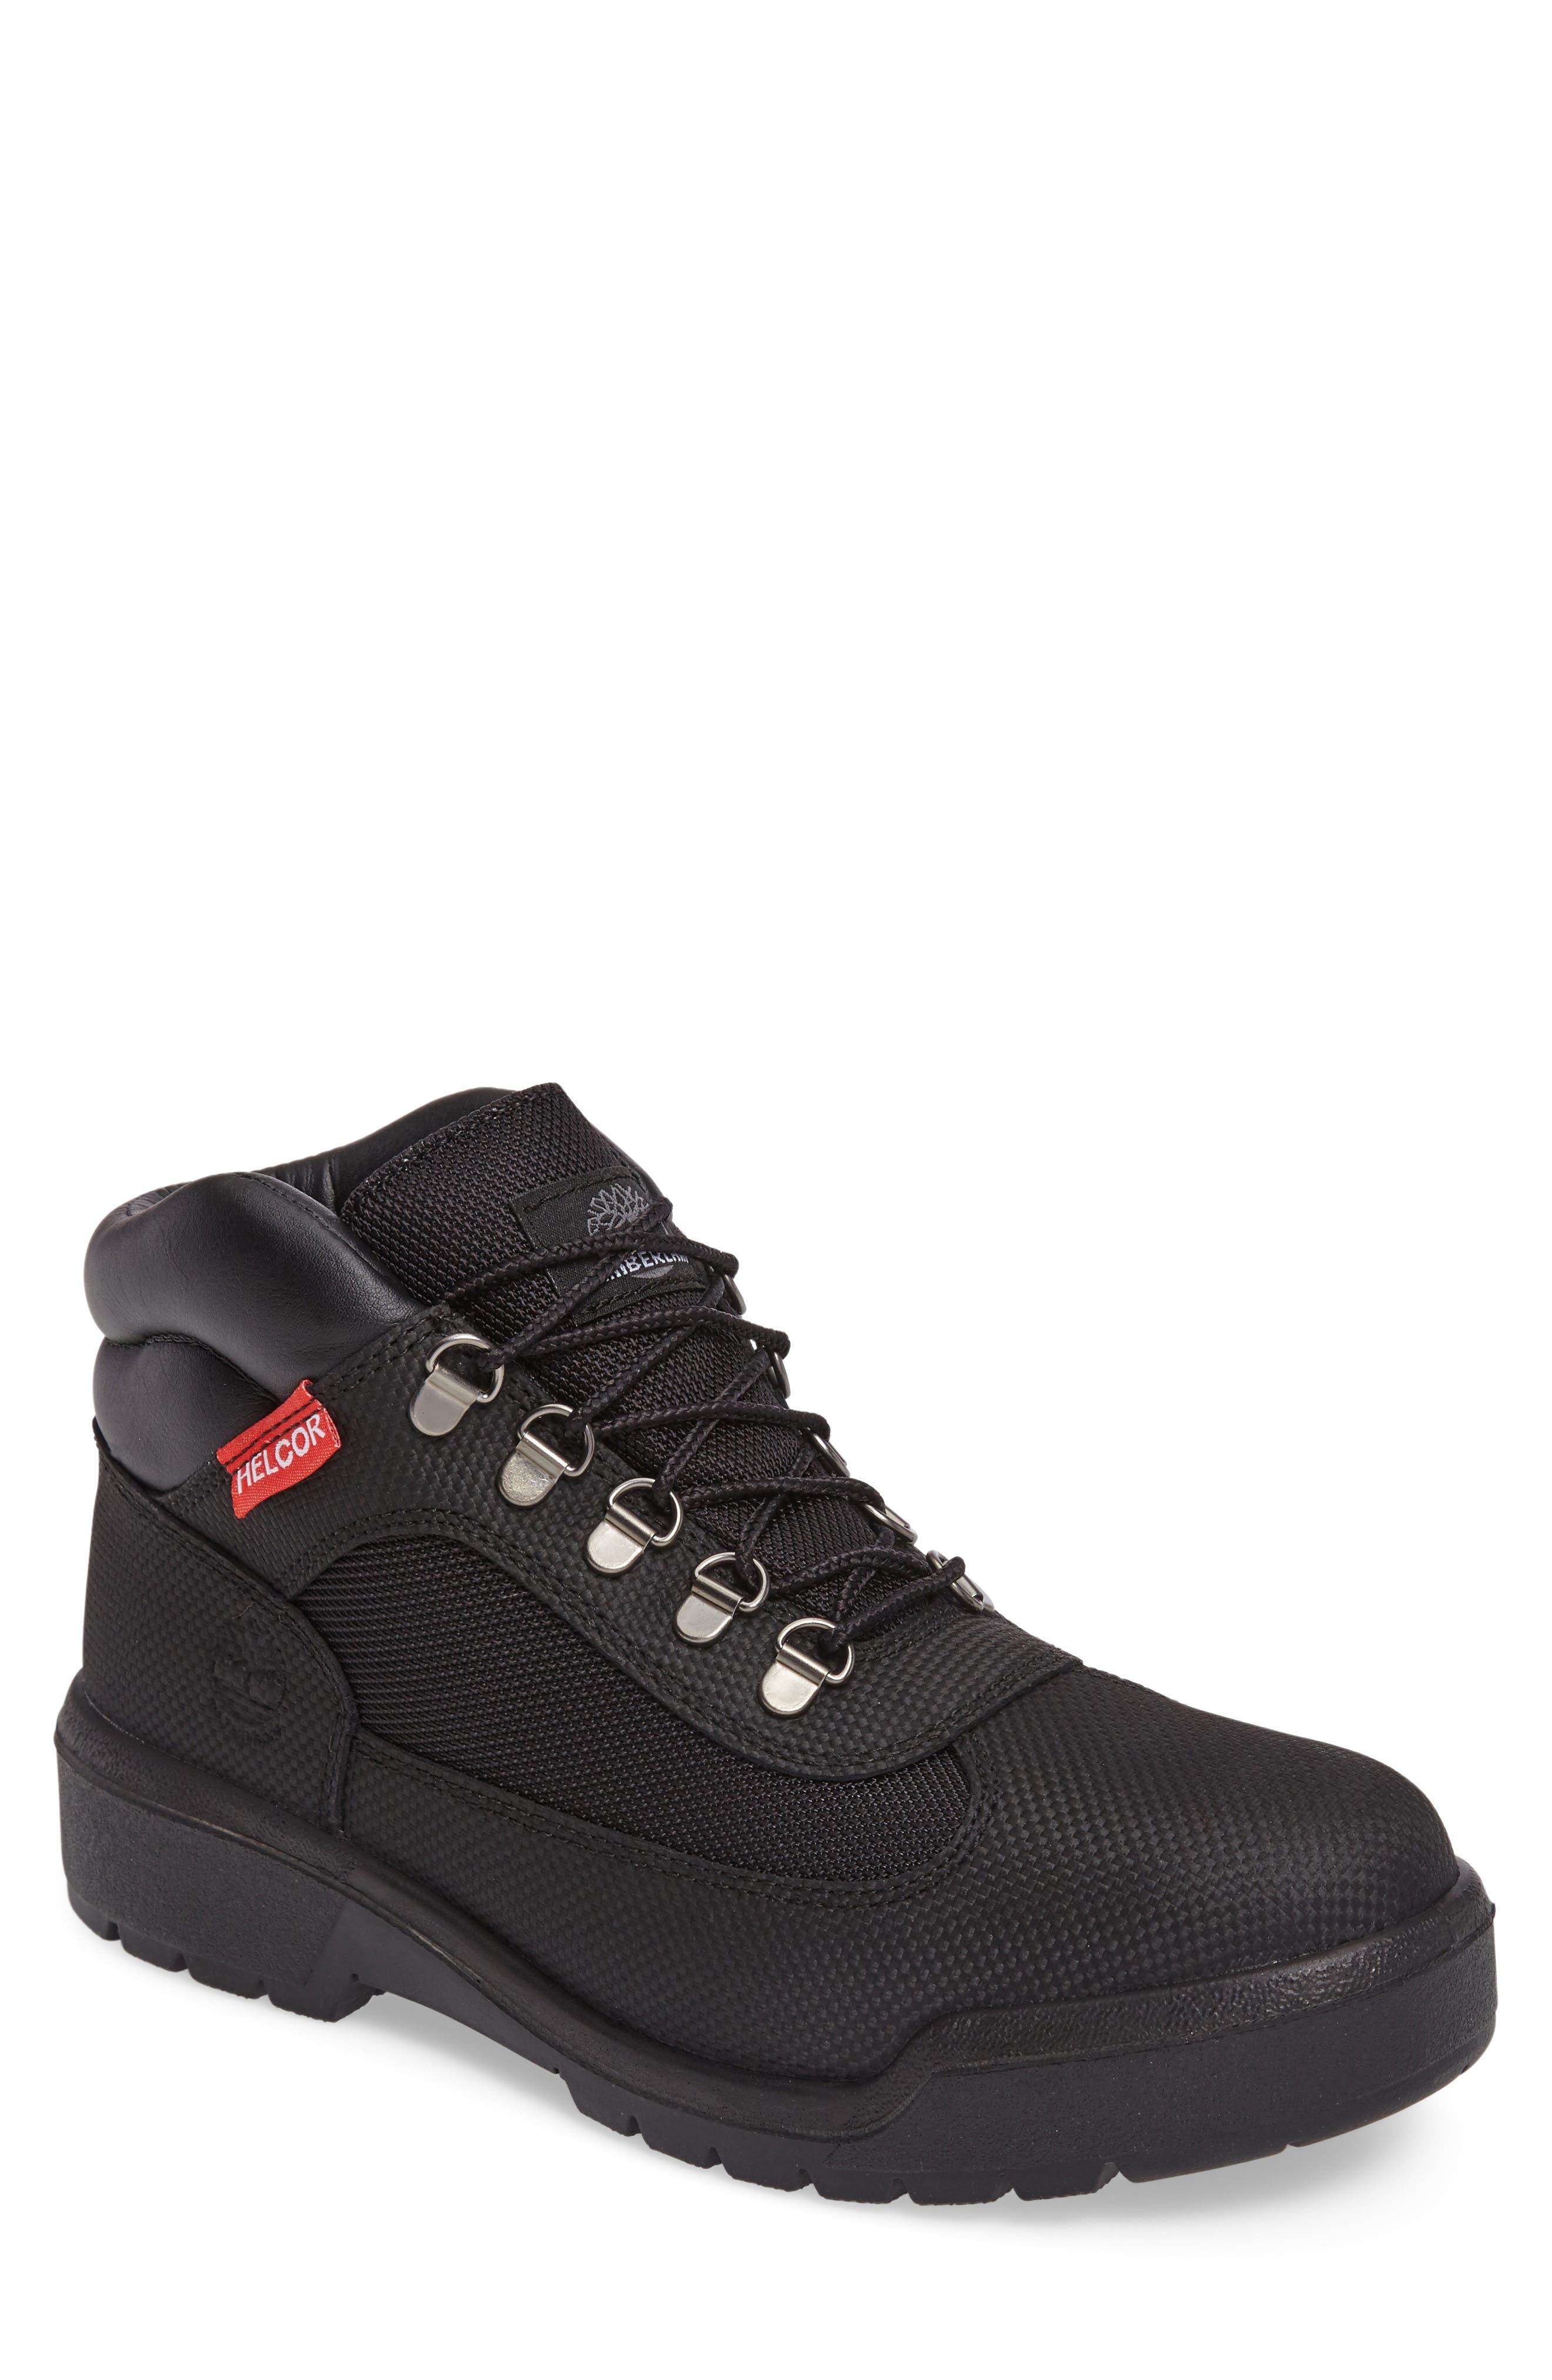 Field Waterproof Hiking Boot,                         Main,                         color, 001